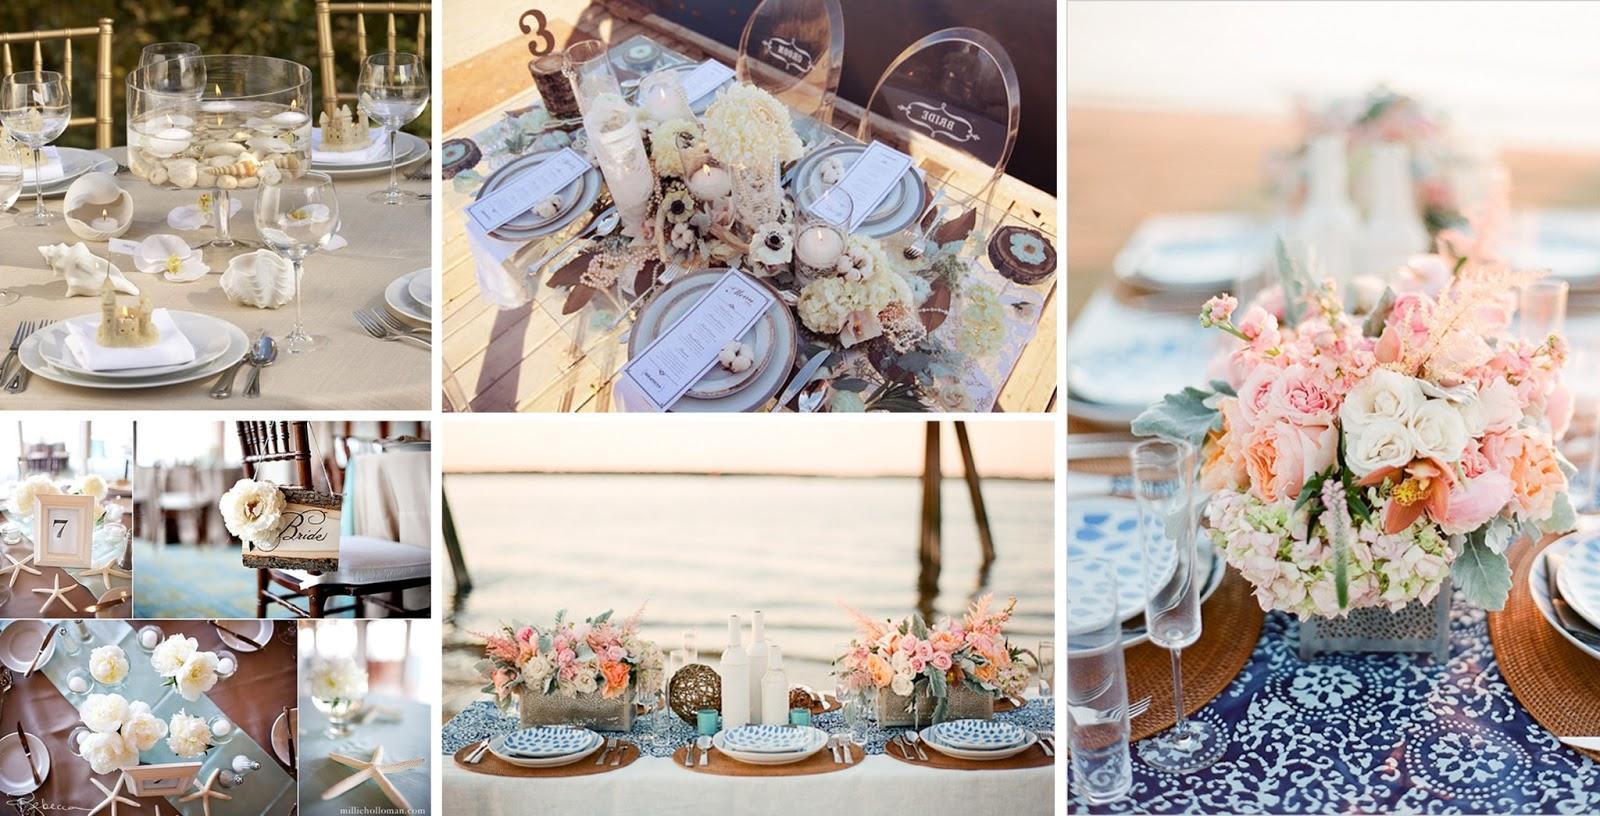 Bodas en la playa paperblog - Decoracion boda playa ...